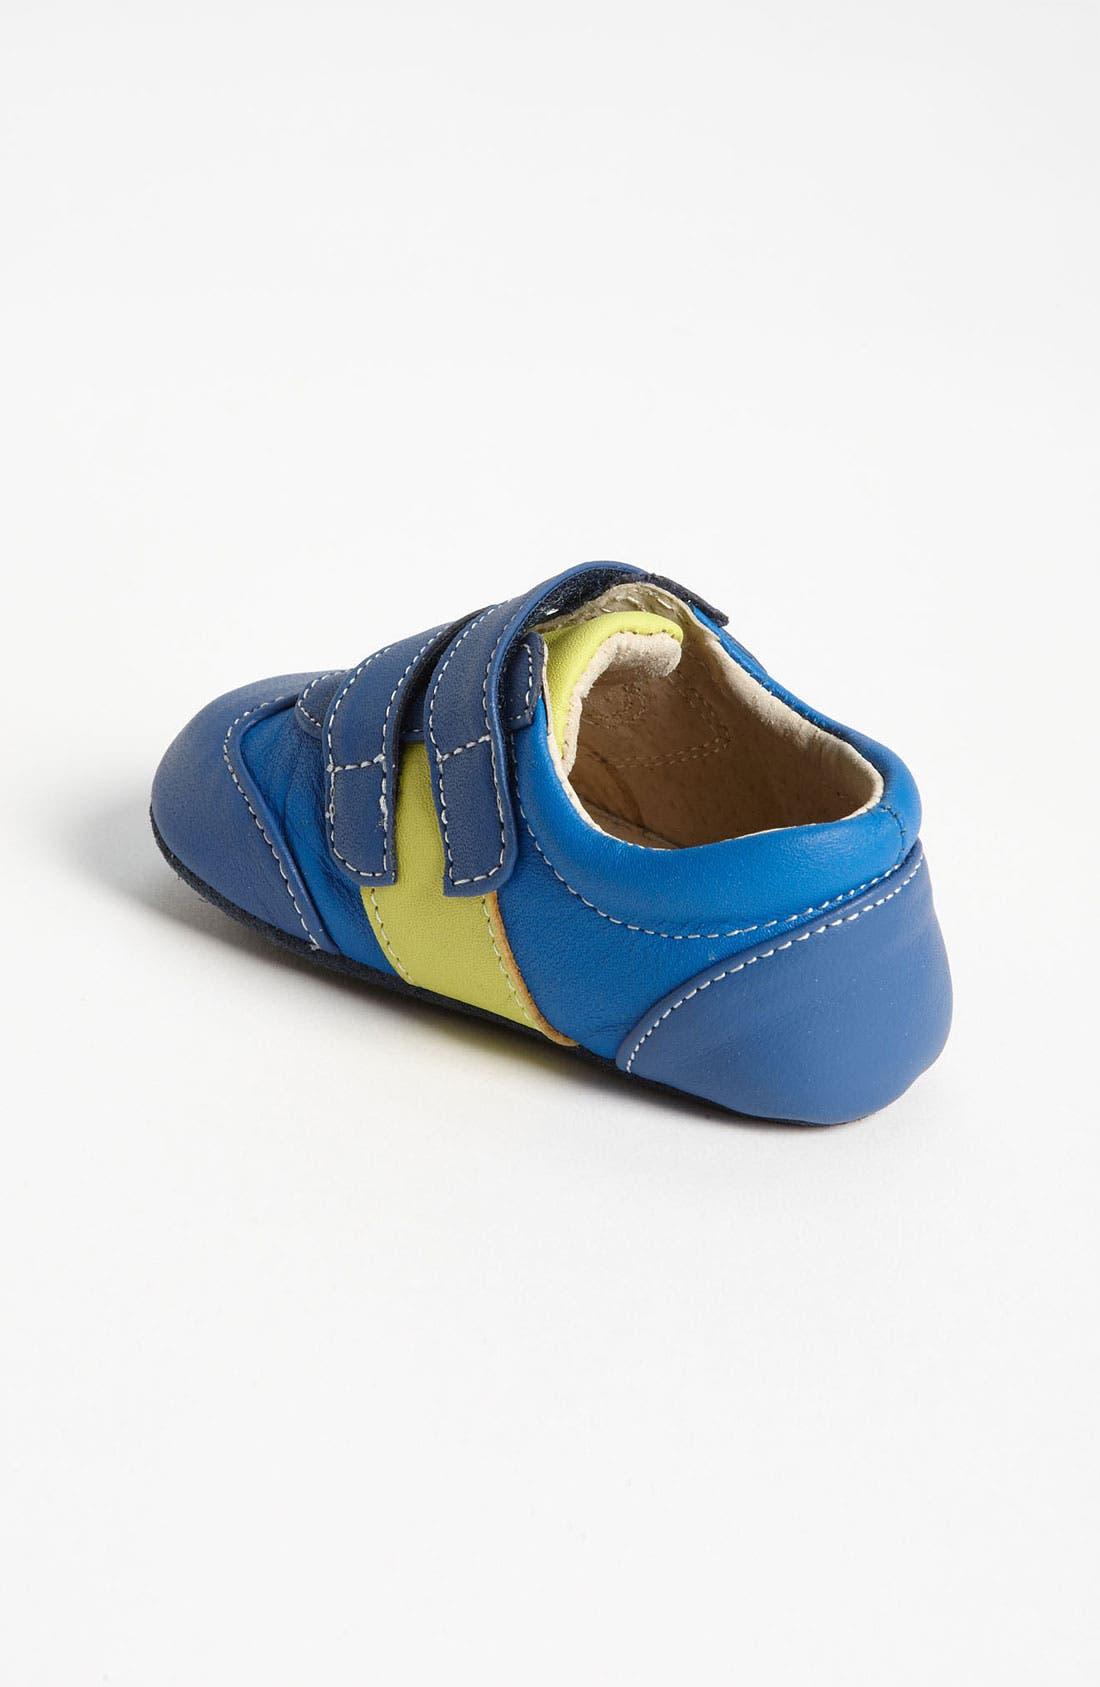 Alternate Image 2  - See Kai Run 'Grant' Sneaker (Baby & Walker)